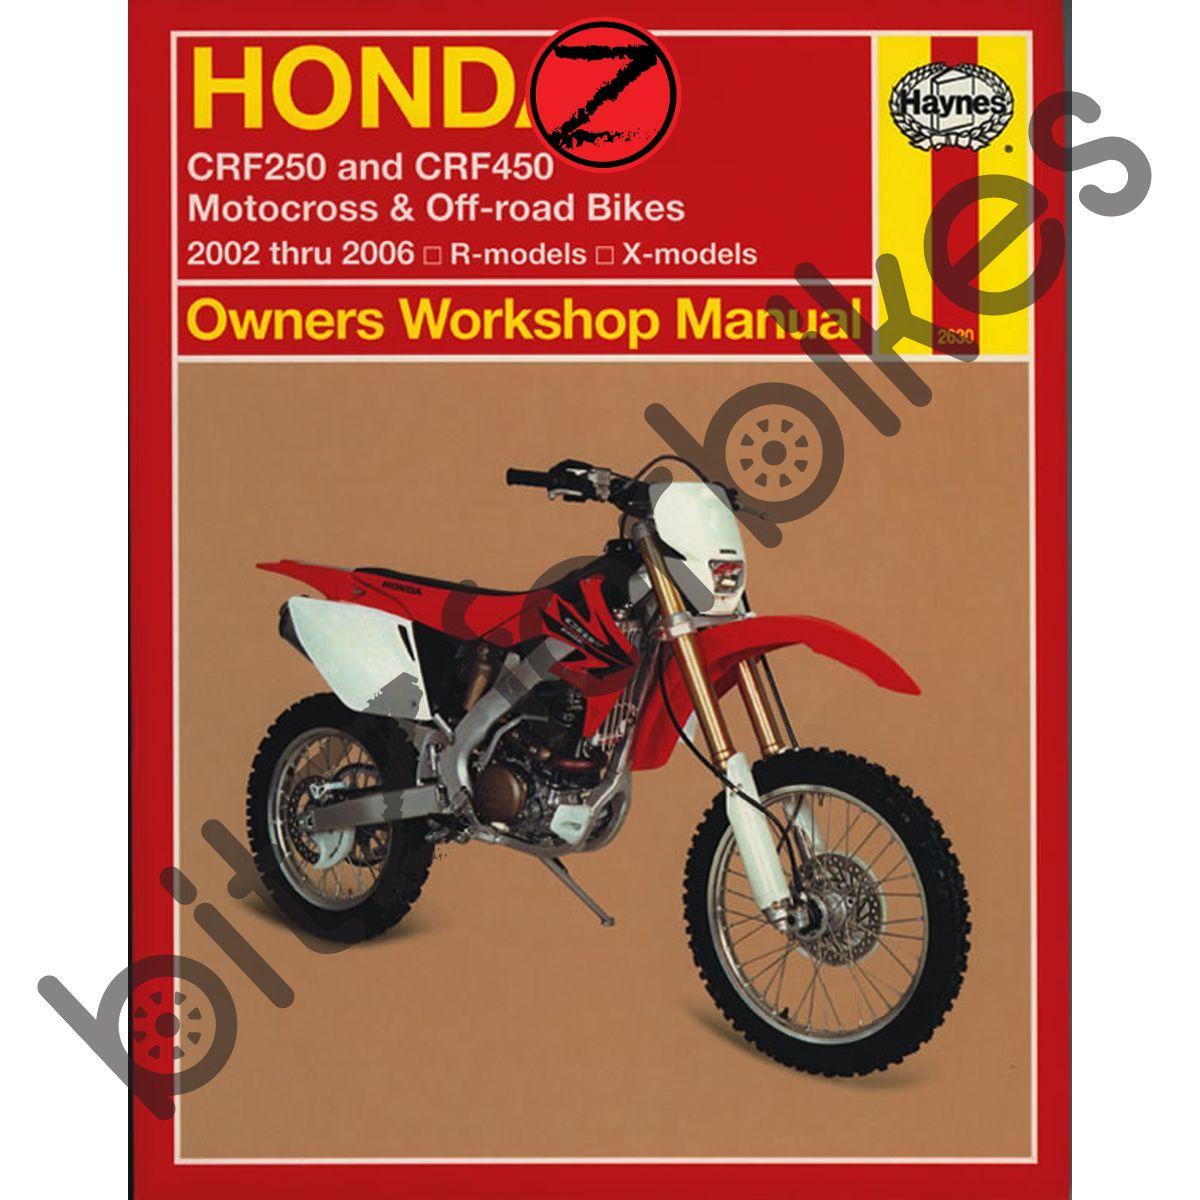 Sentinel Haynes Motorcycle Manual Honda CRF250R CRF250X 04-06 CRF450R  CRF450X 02